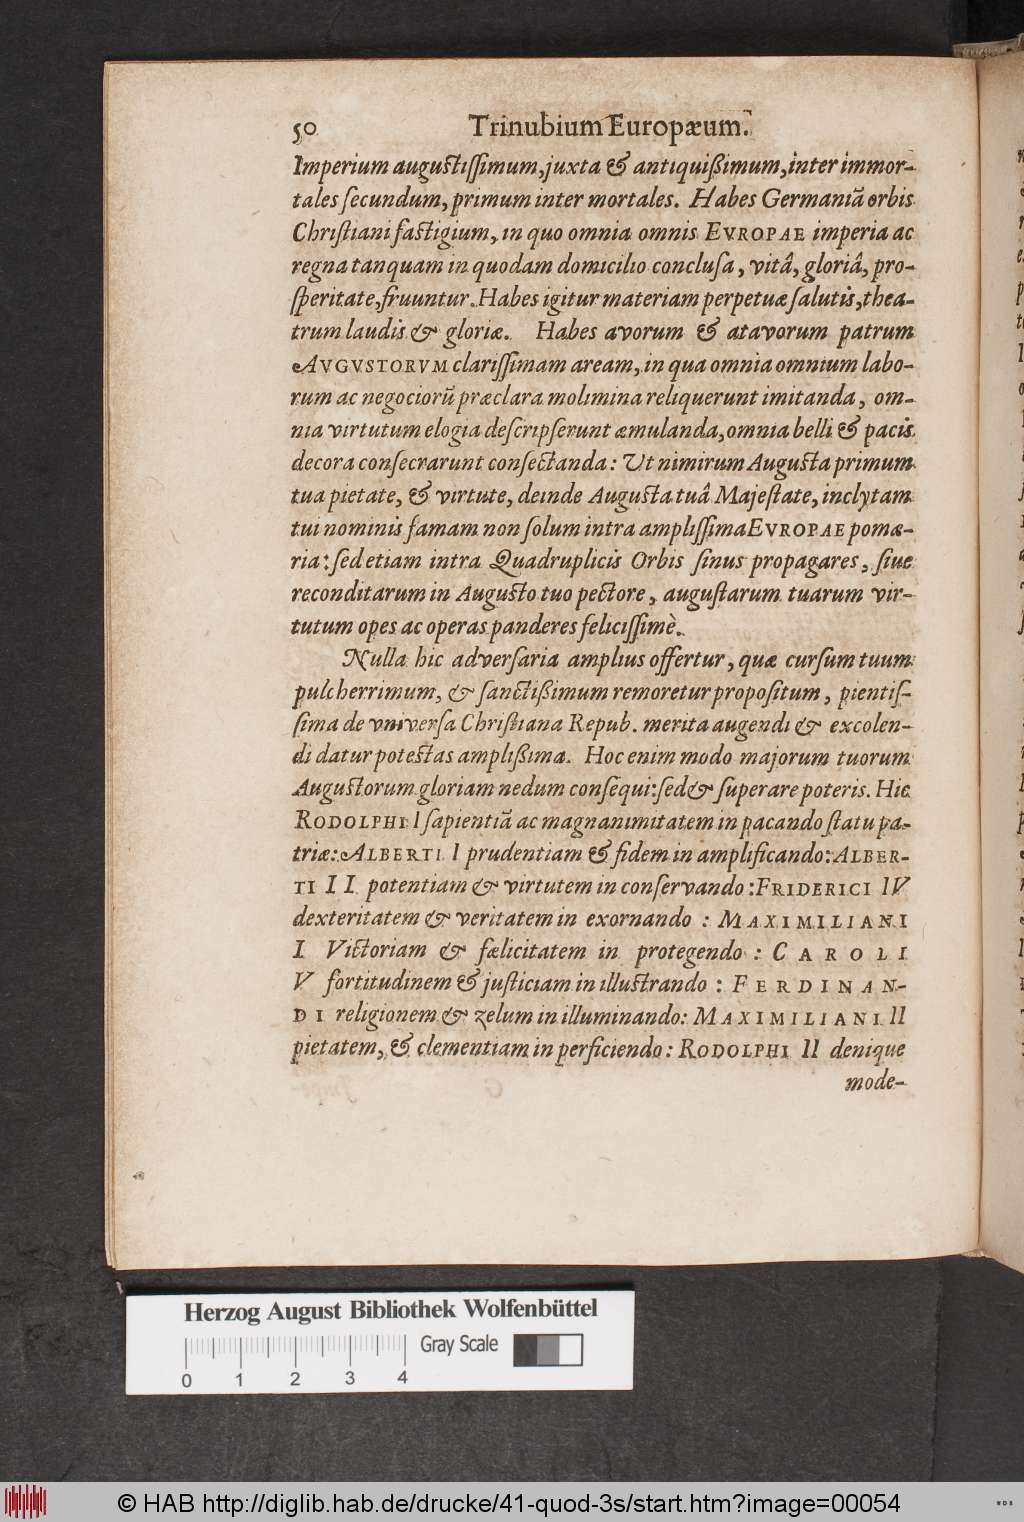 http://diglib.hab.de/drucke/41-quod-3s/00054.jpg